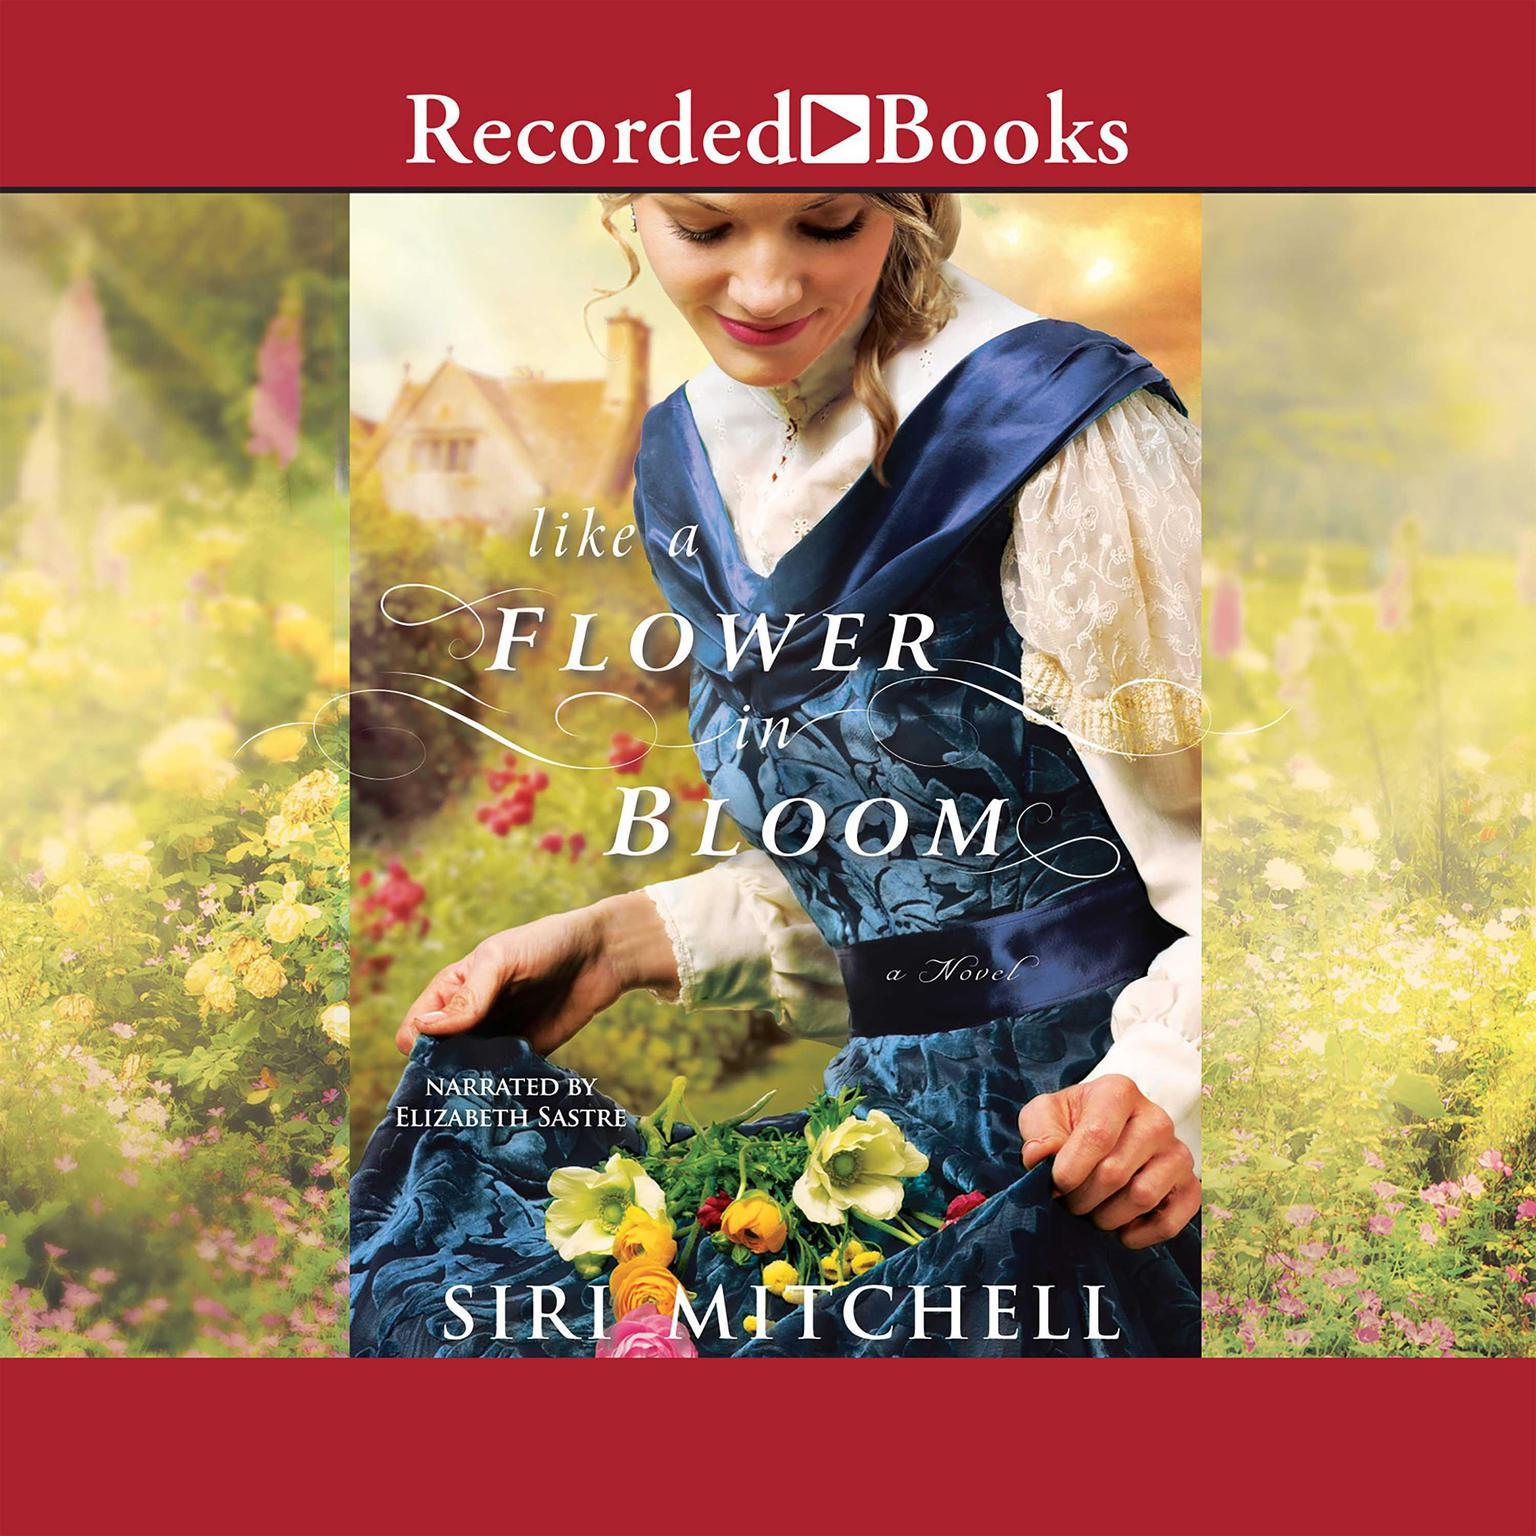 Printable Like a Flower in Bloom Audiobook Cover Art